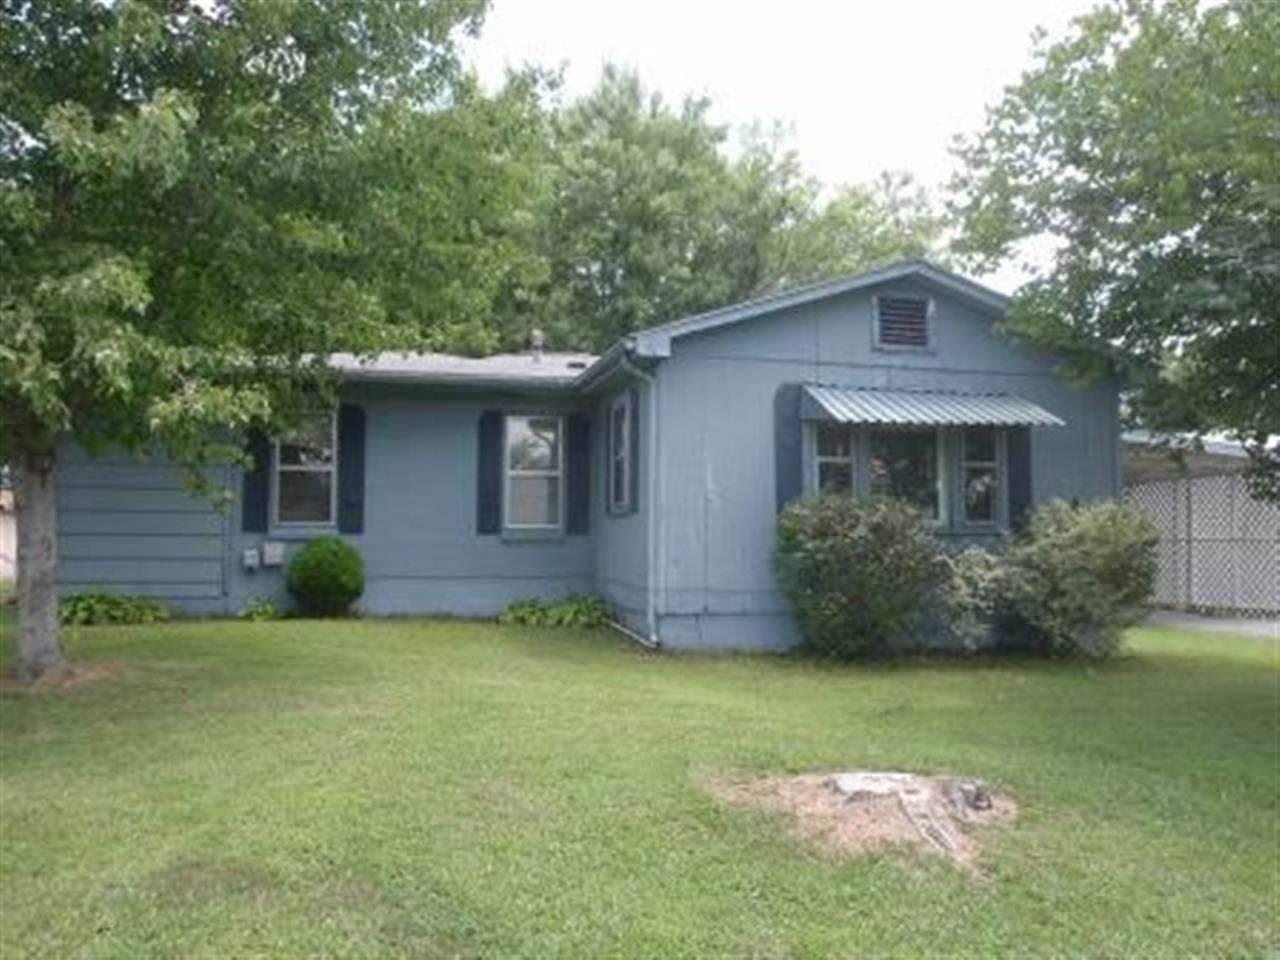 Rental Homes for Rent, ListingId:35100064, location: 587 S Main St Calvert City 42029